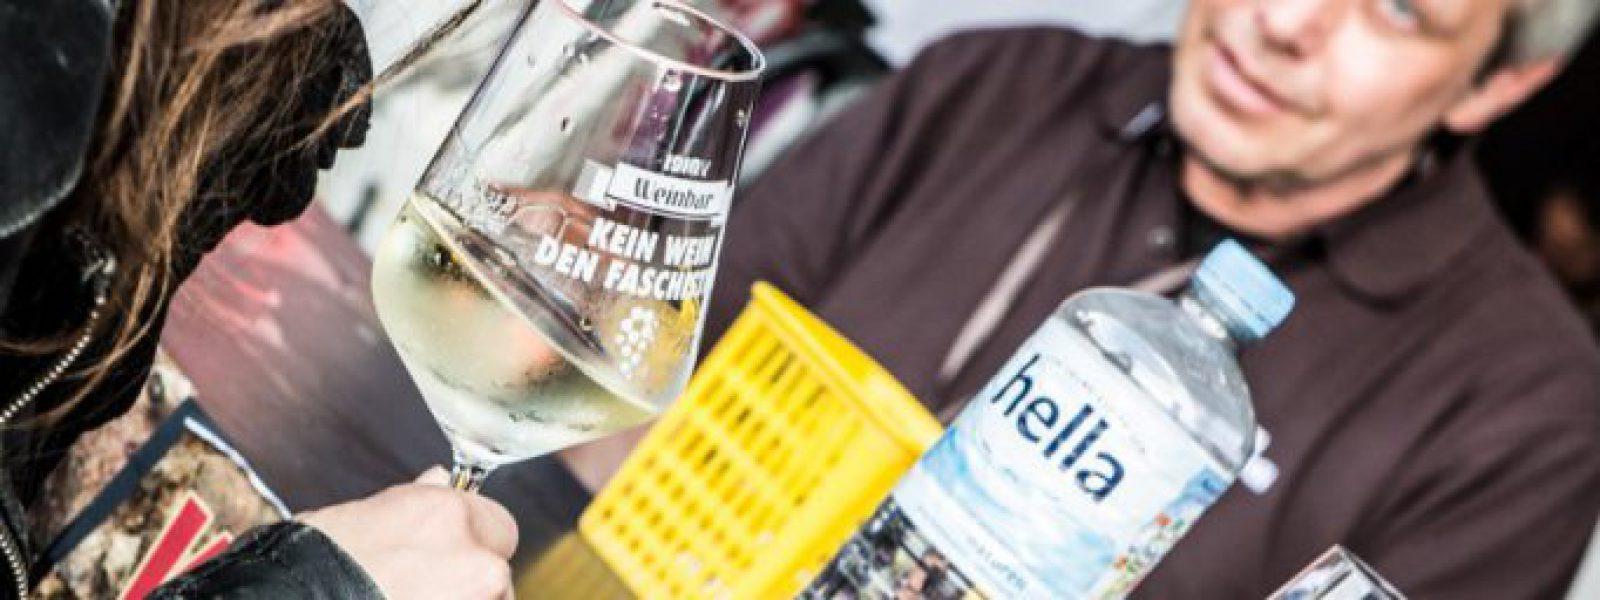 Weinfest gegen Rassismus (Fotos Sabrina Adeline Nagel) - 23